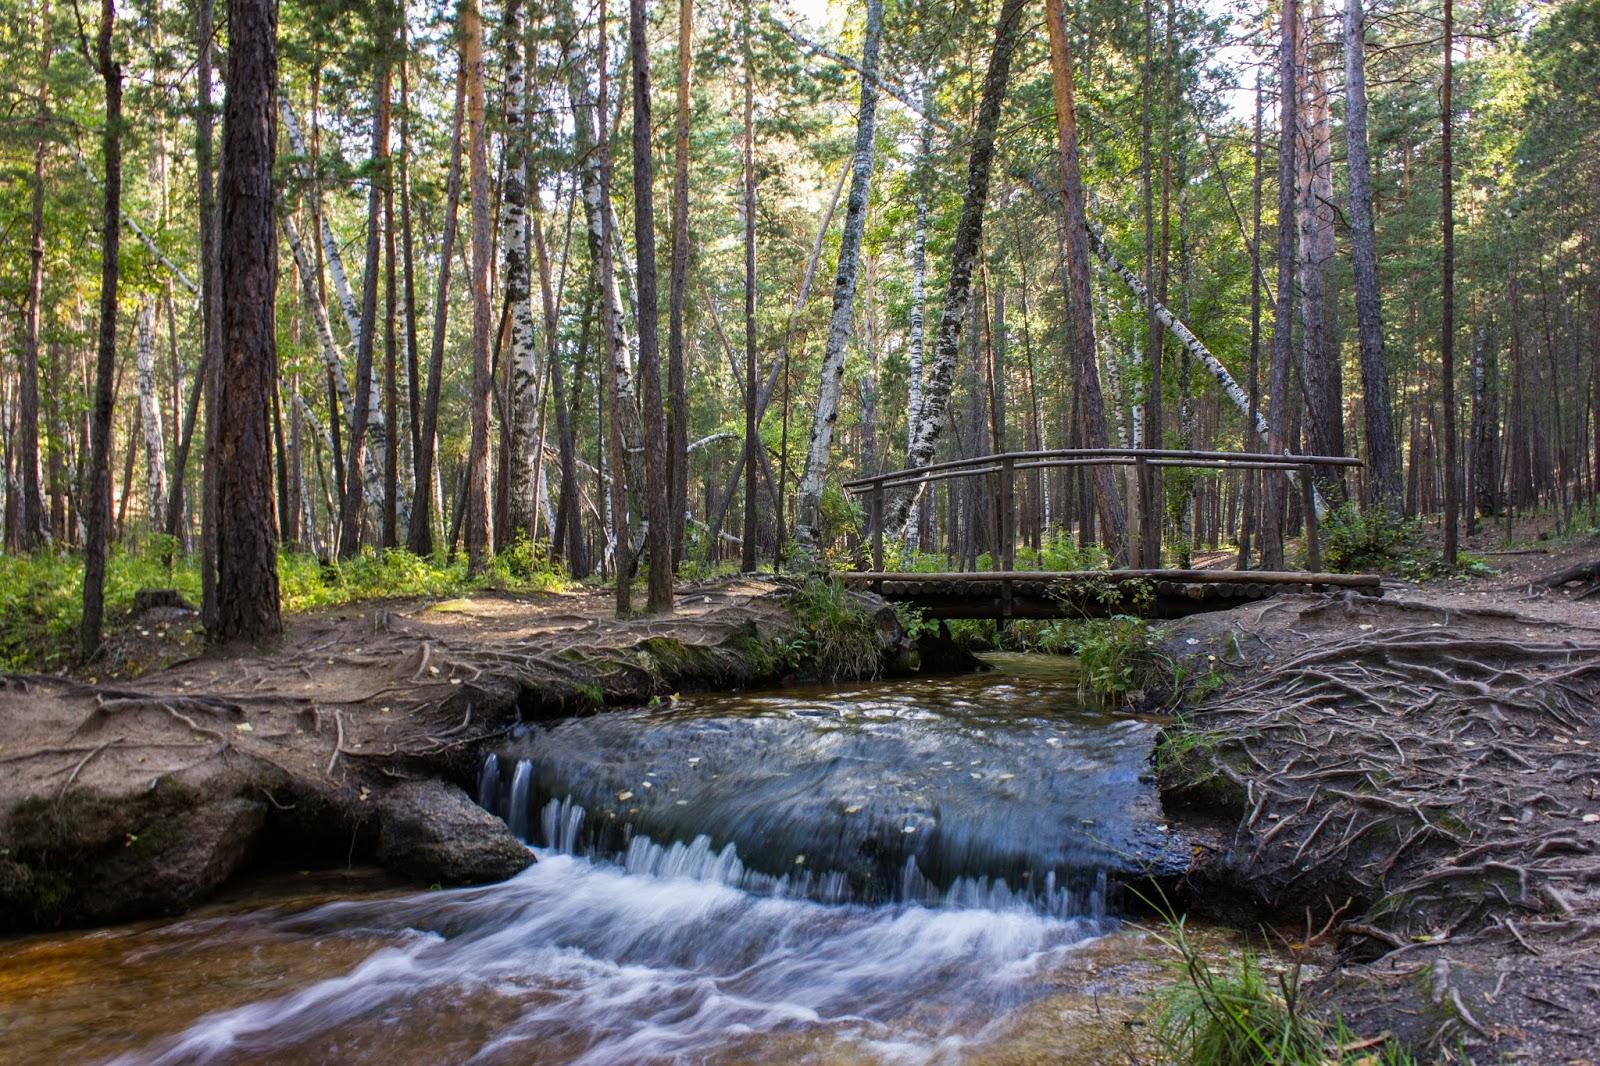 Казахстан, Боровое, Бурабай, Маленький водопад, Имантаевский ключ